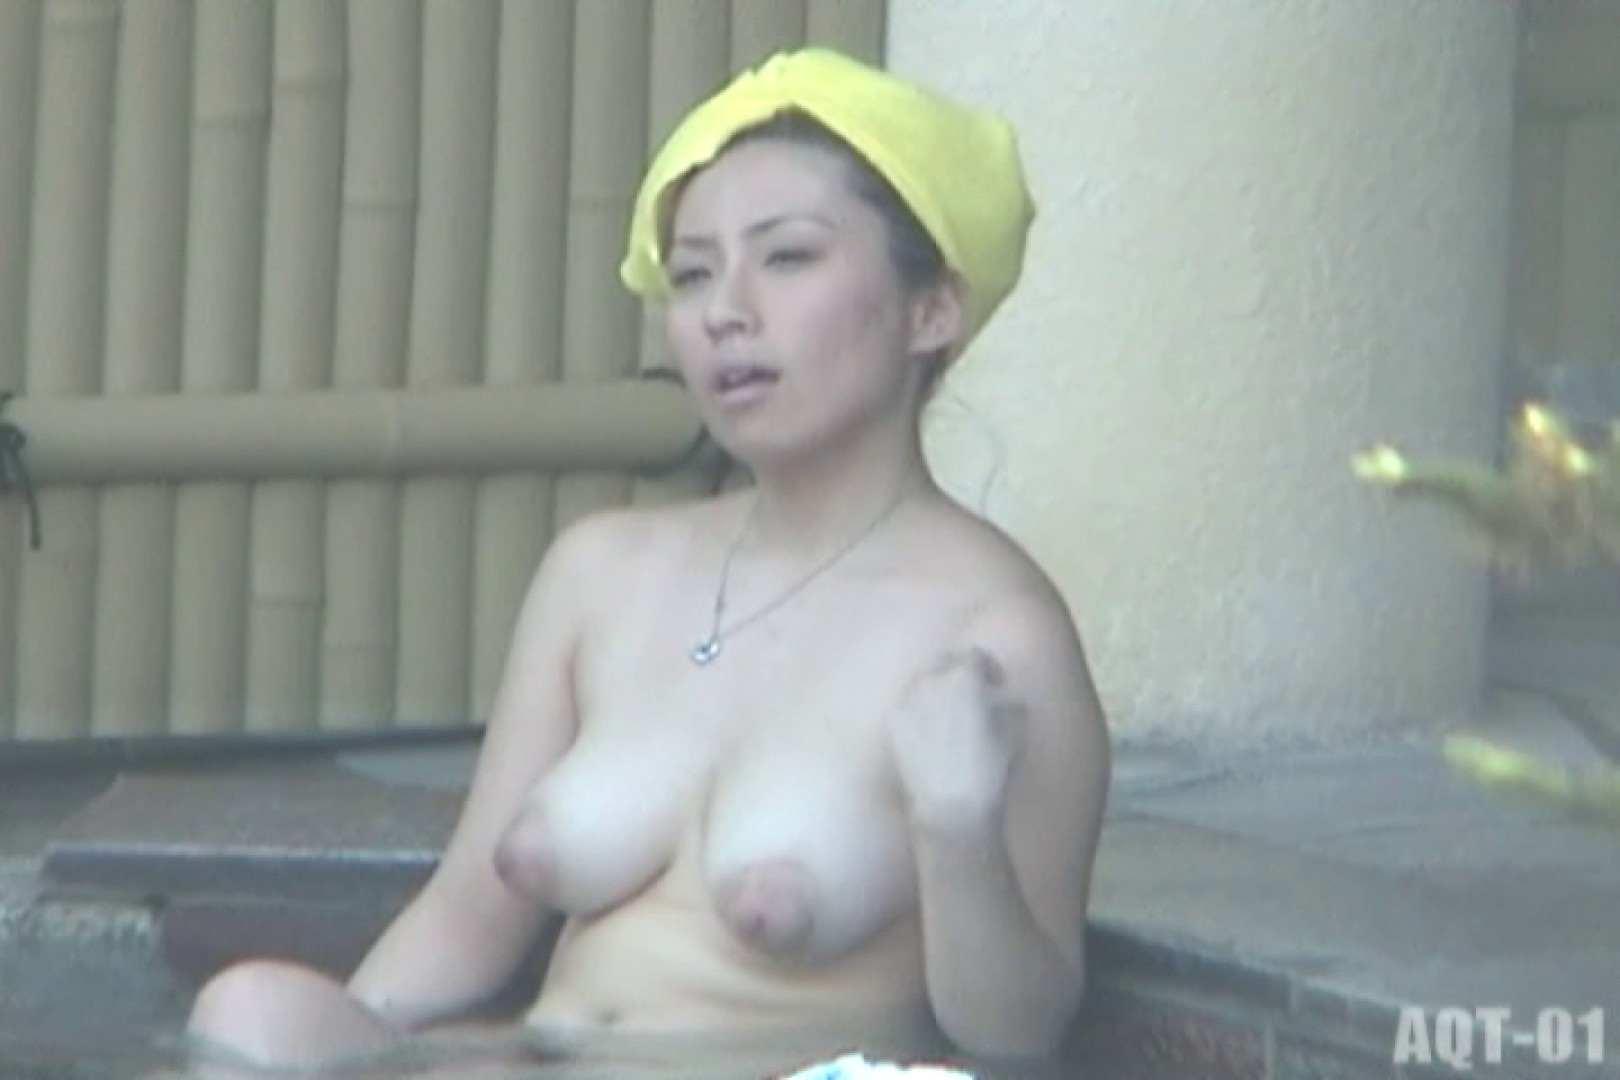 Aquaな露天風呂Vol.713 HなOL | 露天  52pic 45